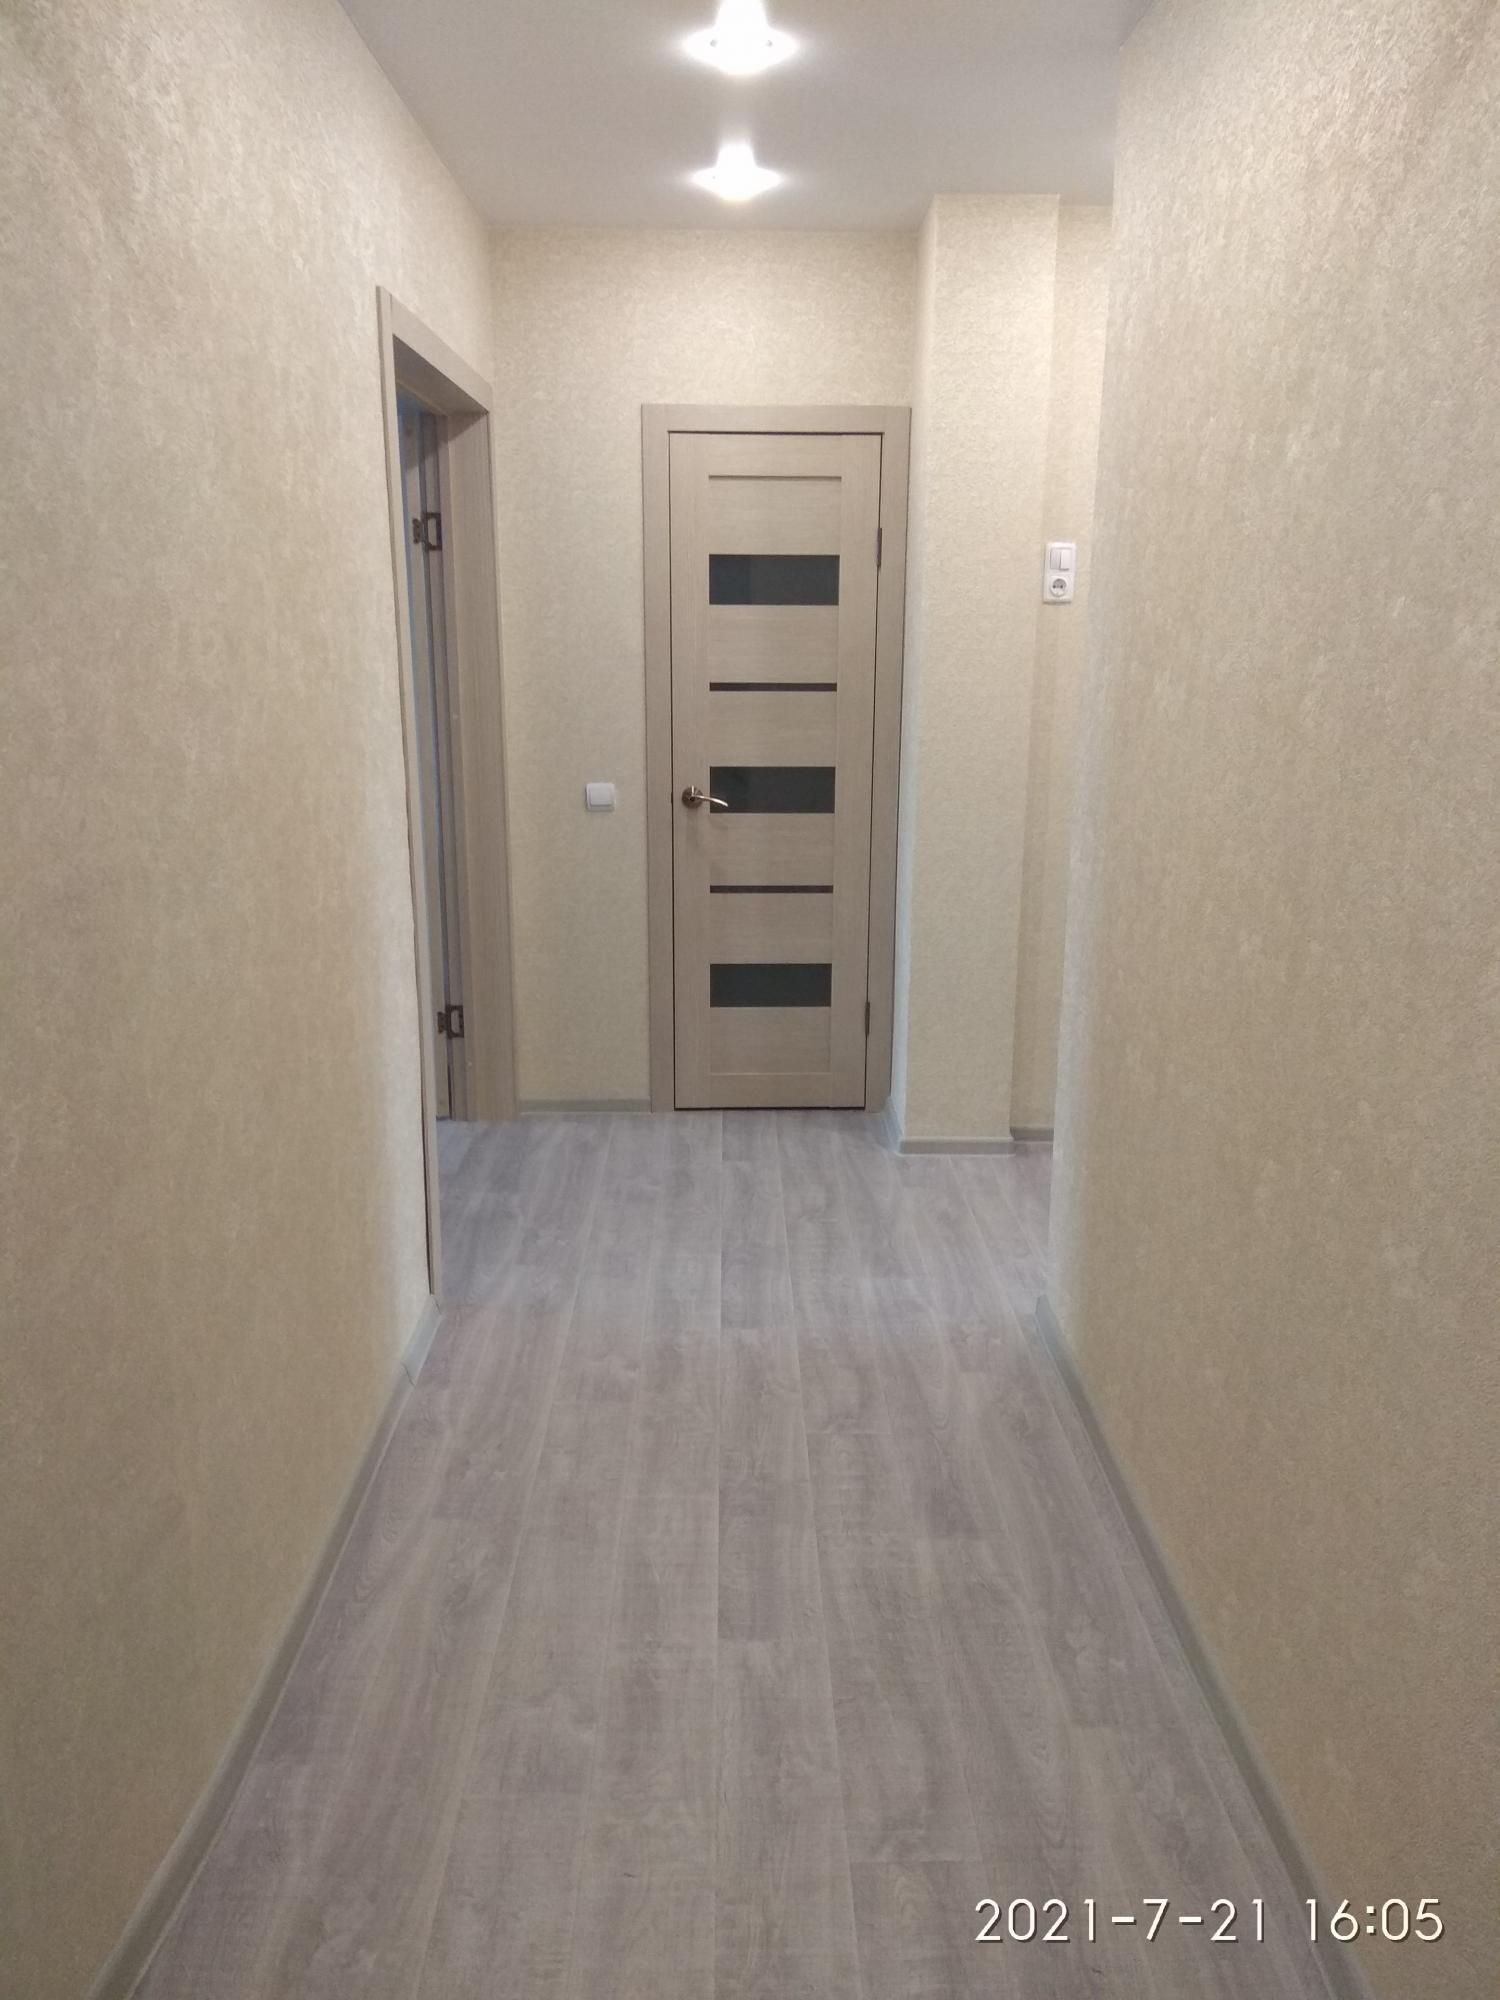 1к квартира улица Чернышёва, 2 | 15000 | аренда в Красноярске фото 7